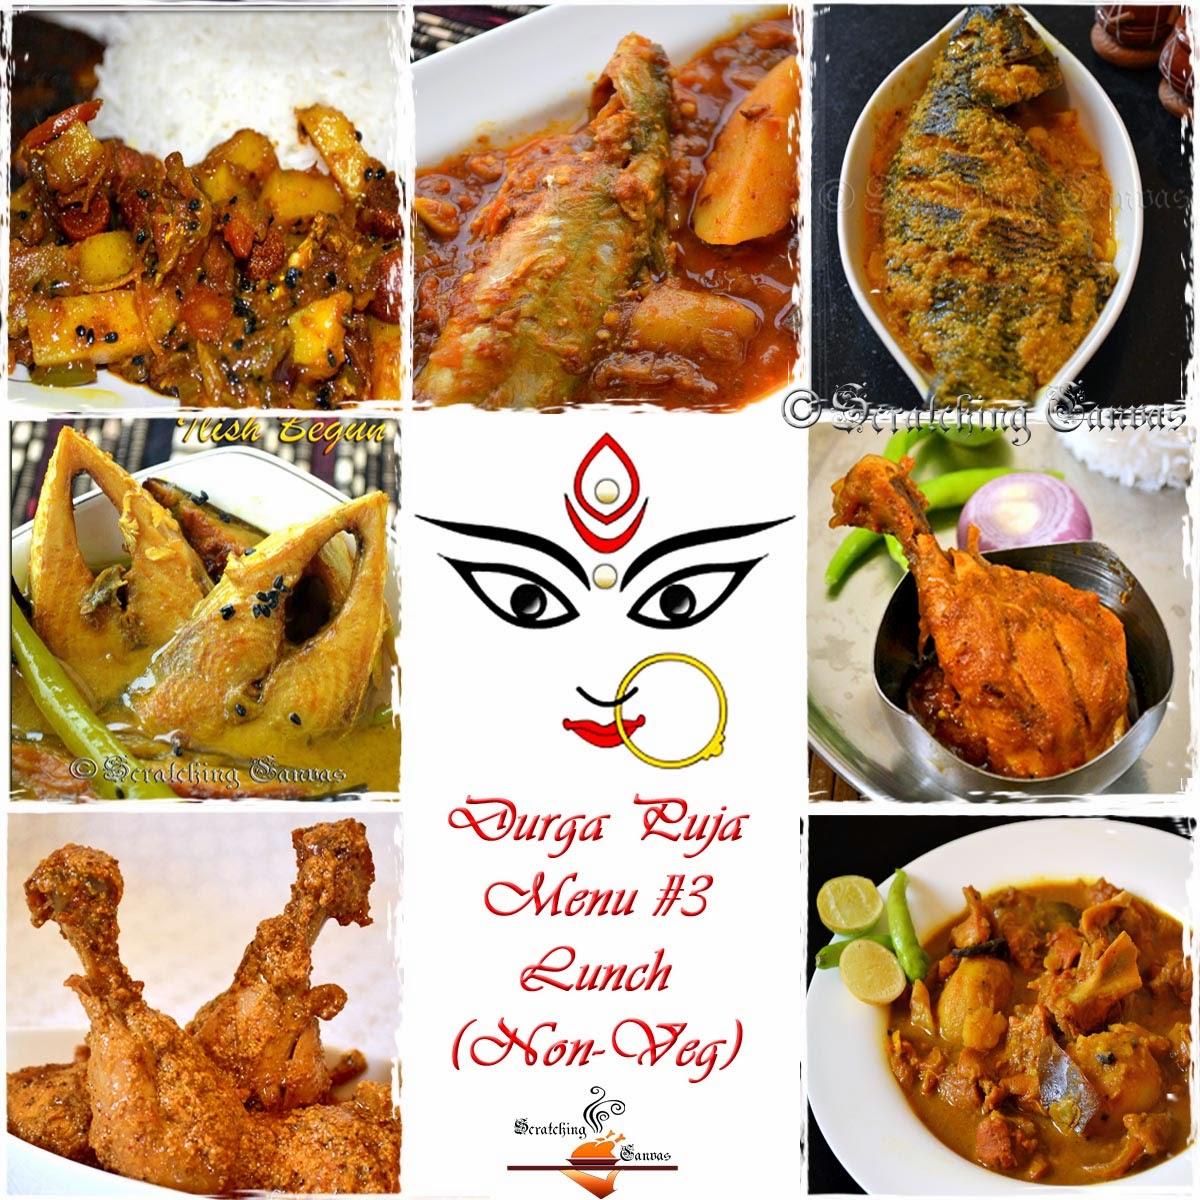 Durga pujor bhuribhoj bengali festival food menu roundup non veg durga puja lunch meat forumfinder Choice Image